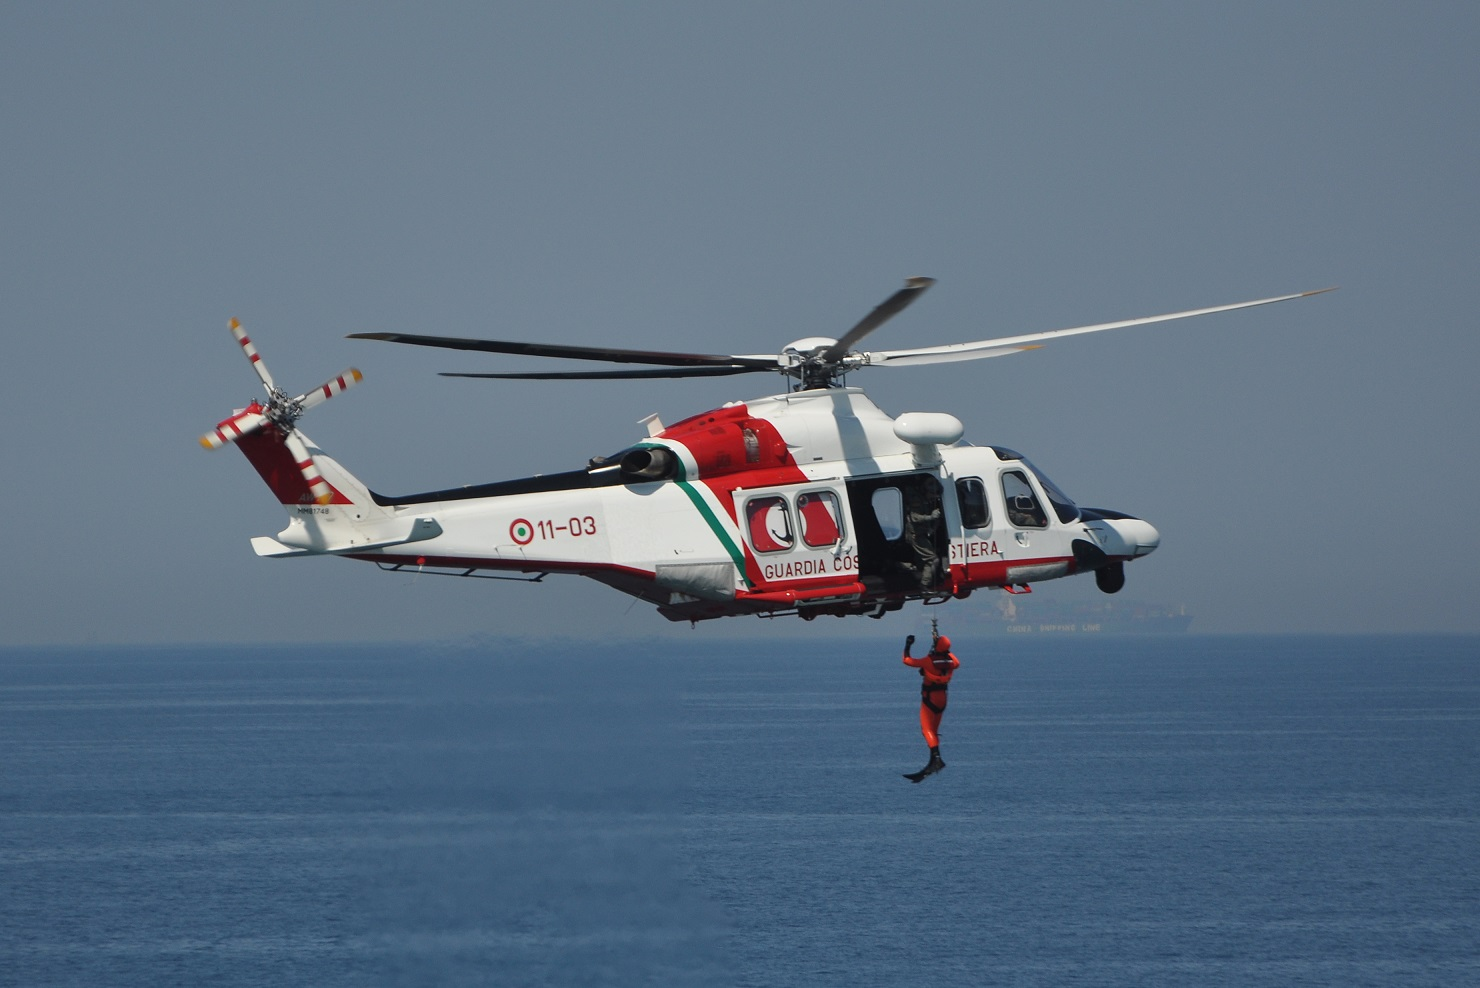 Tragedia in costiera amalfitana: morto sub